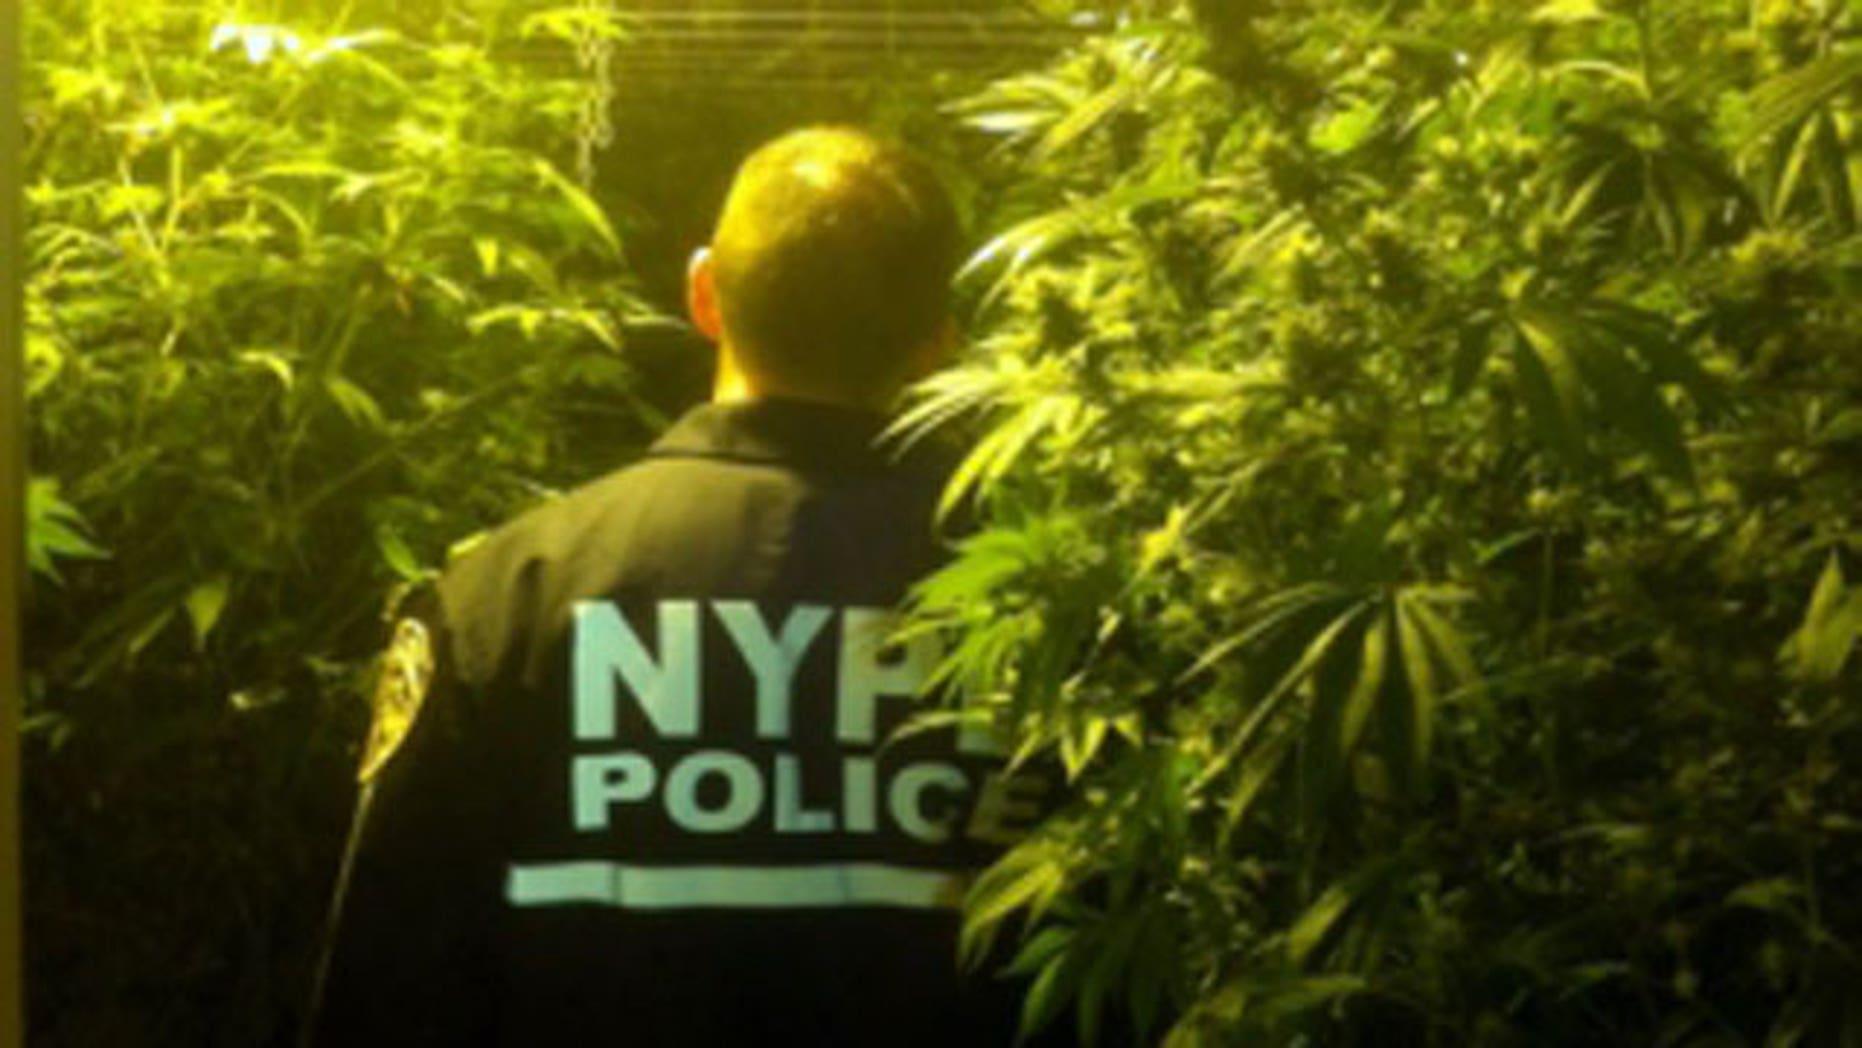 January 31, 2012: Scene of raid on Bronx building that contained 600 marijuana plants.